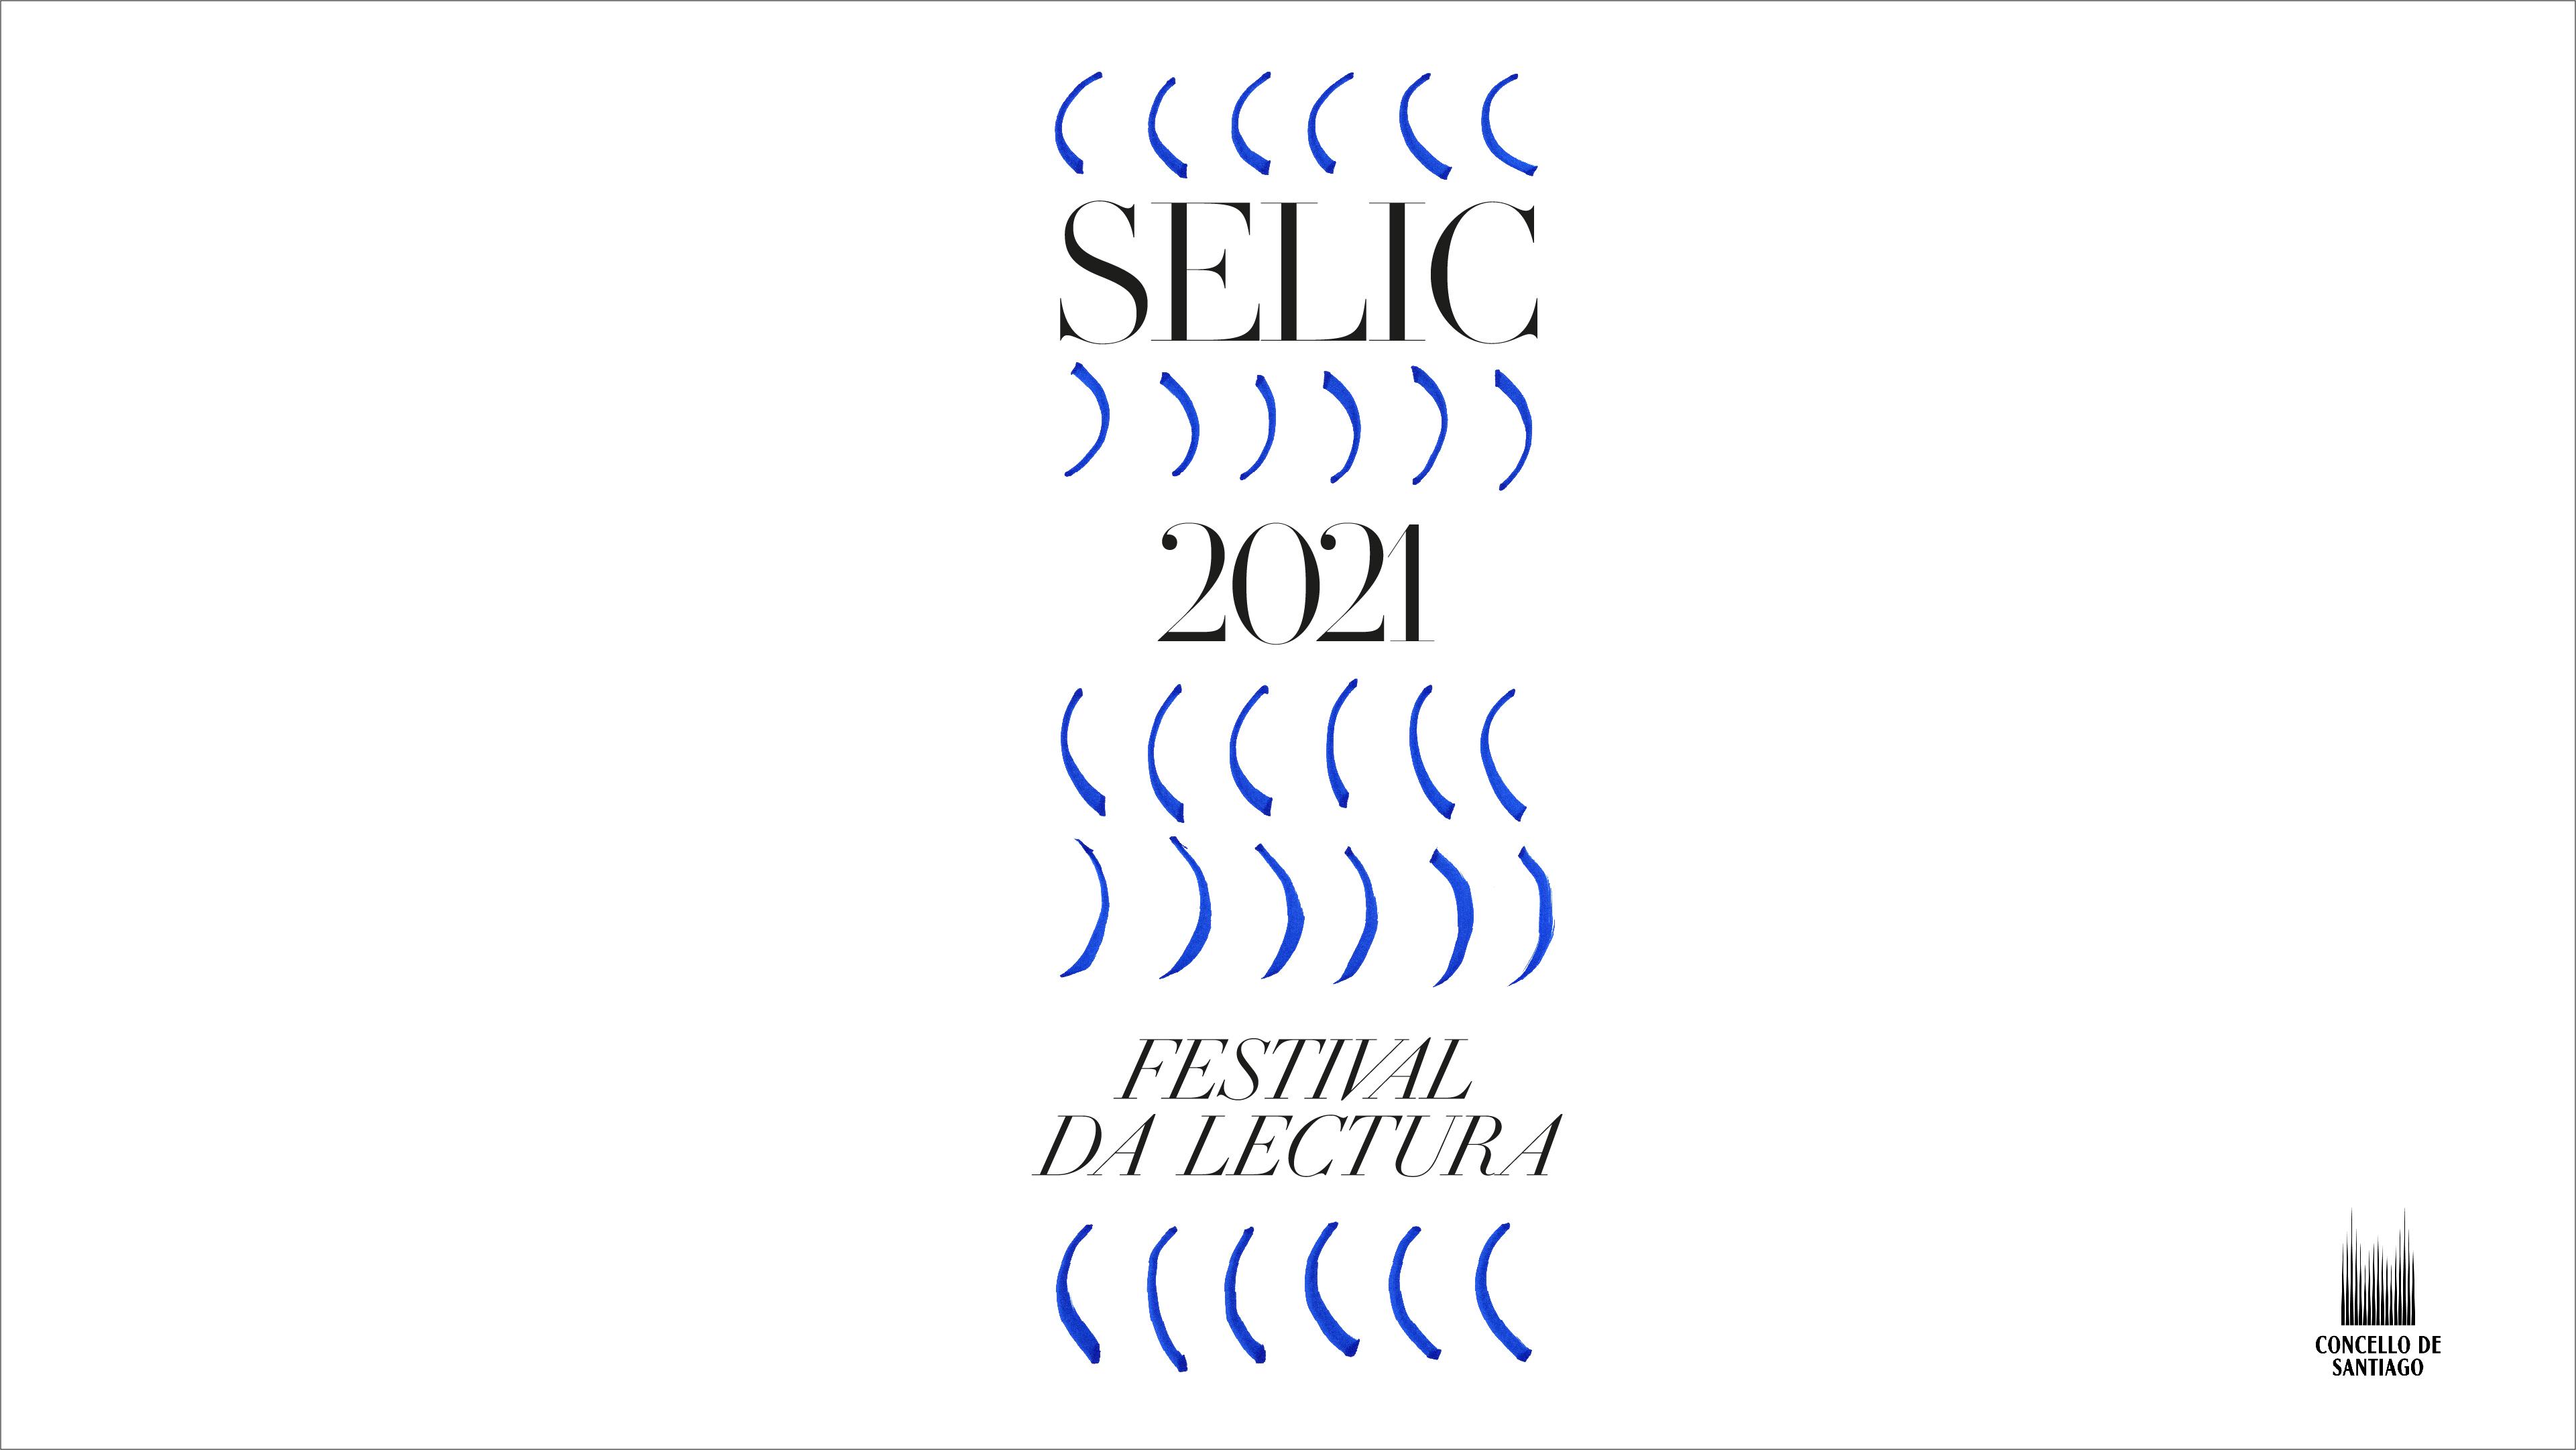 Imaxe da SELIC 2021